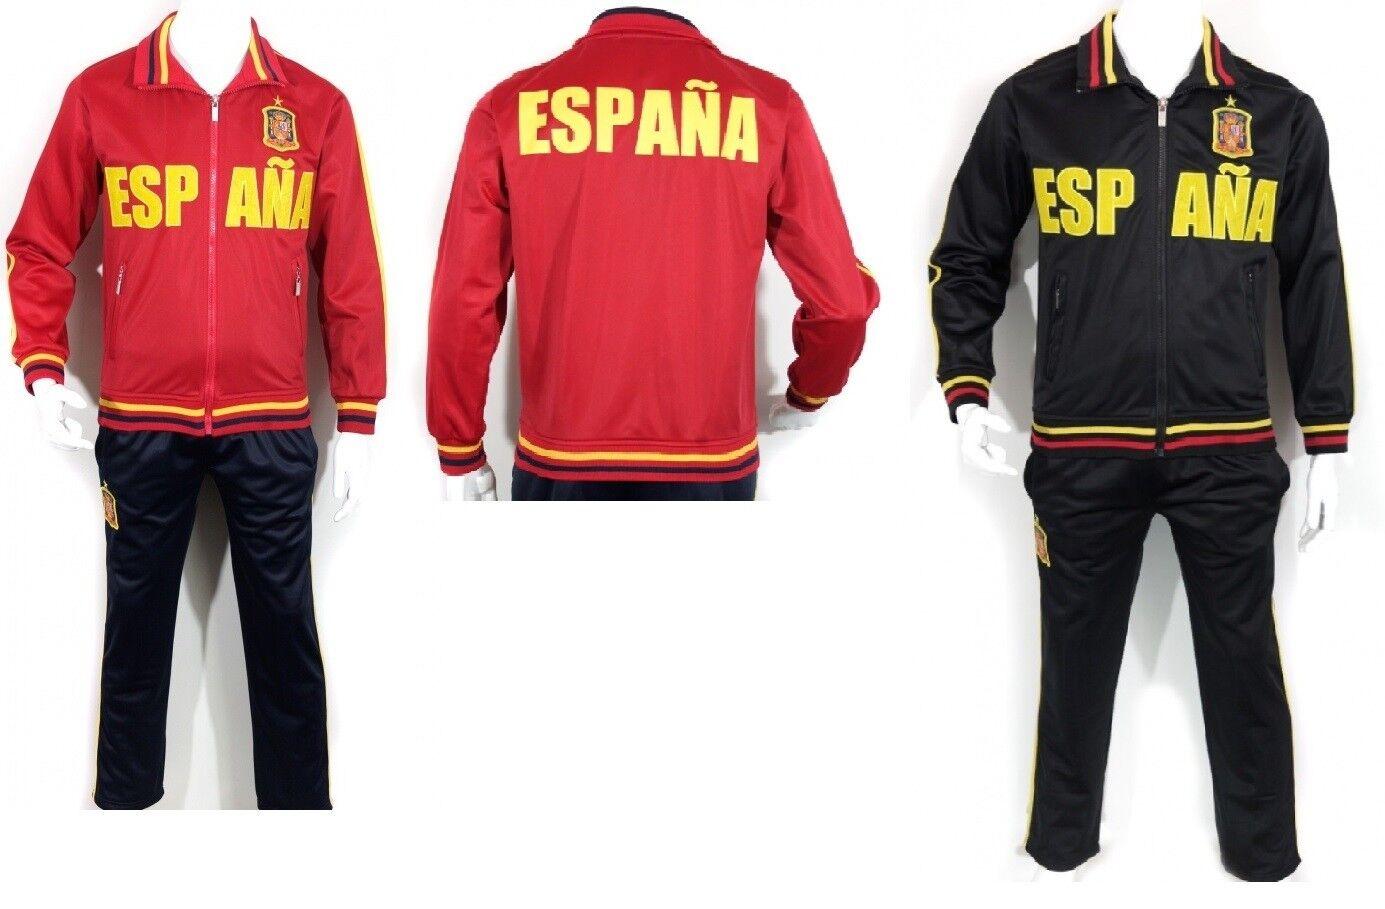 Kinder Jungen Jogginganzug Trainingsanzug Hose Jacke set Spanien Espana Spain